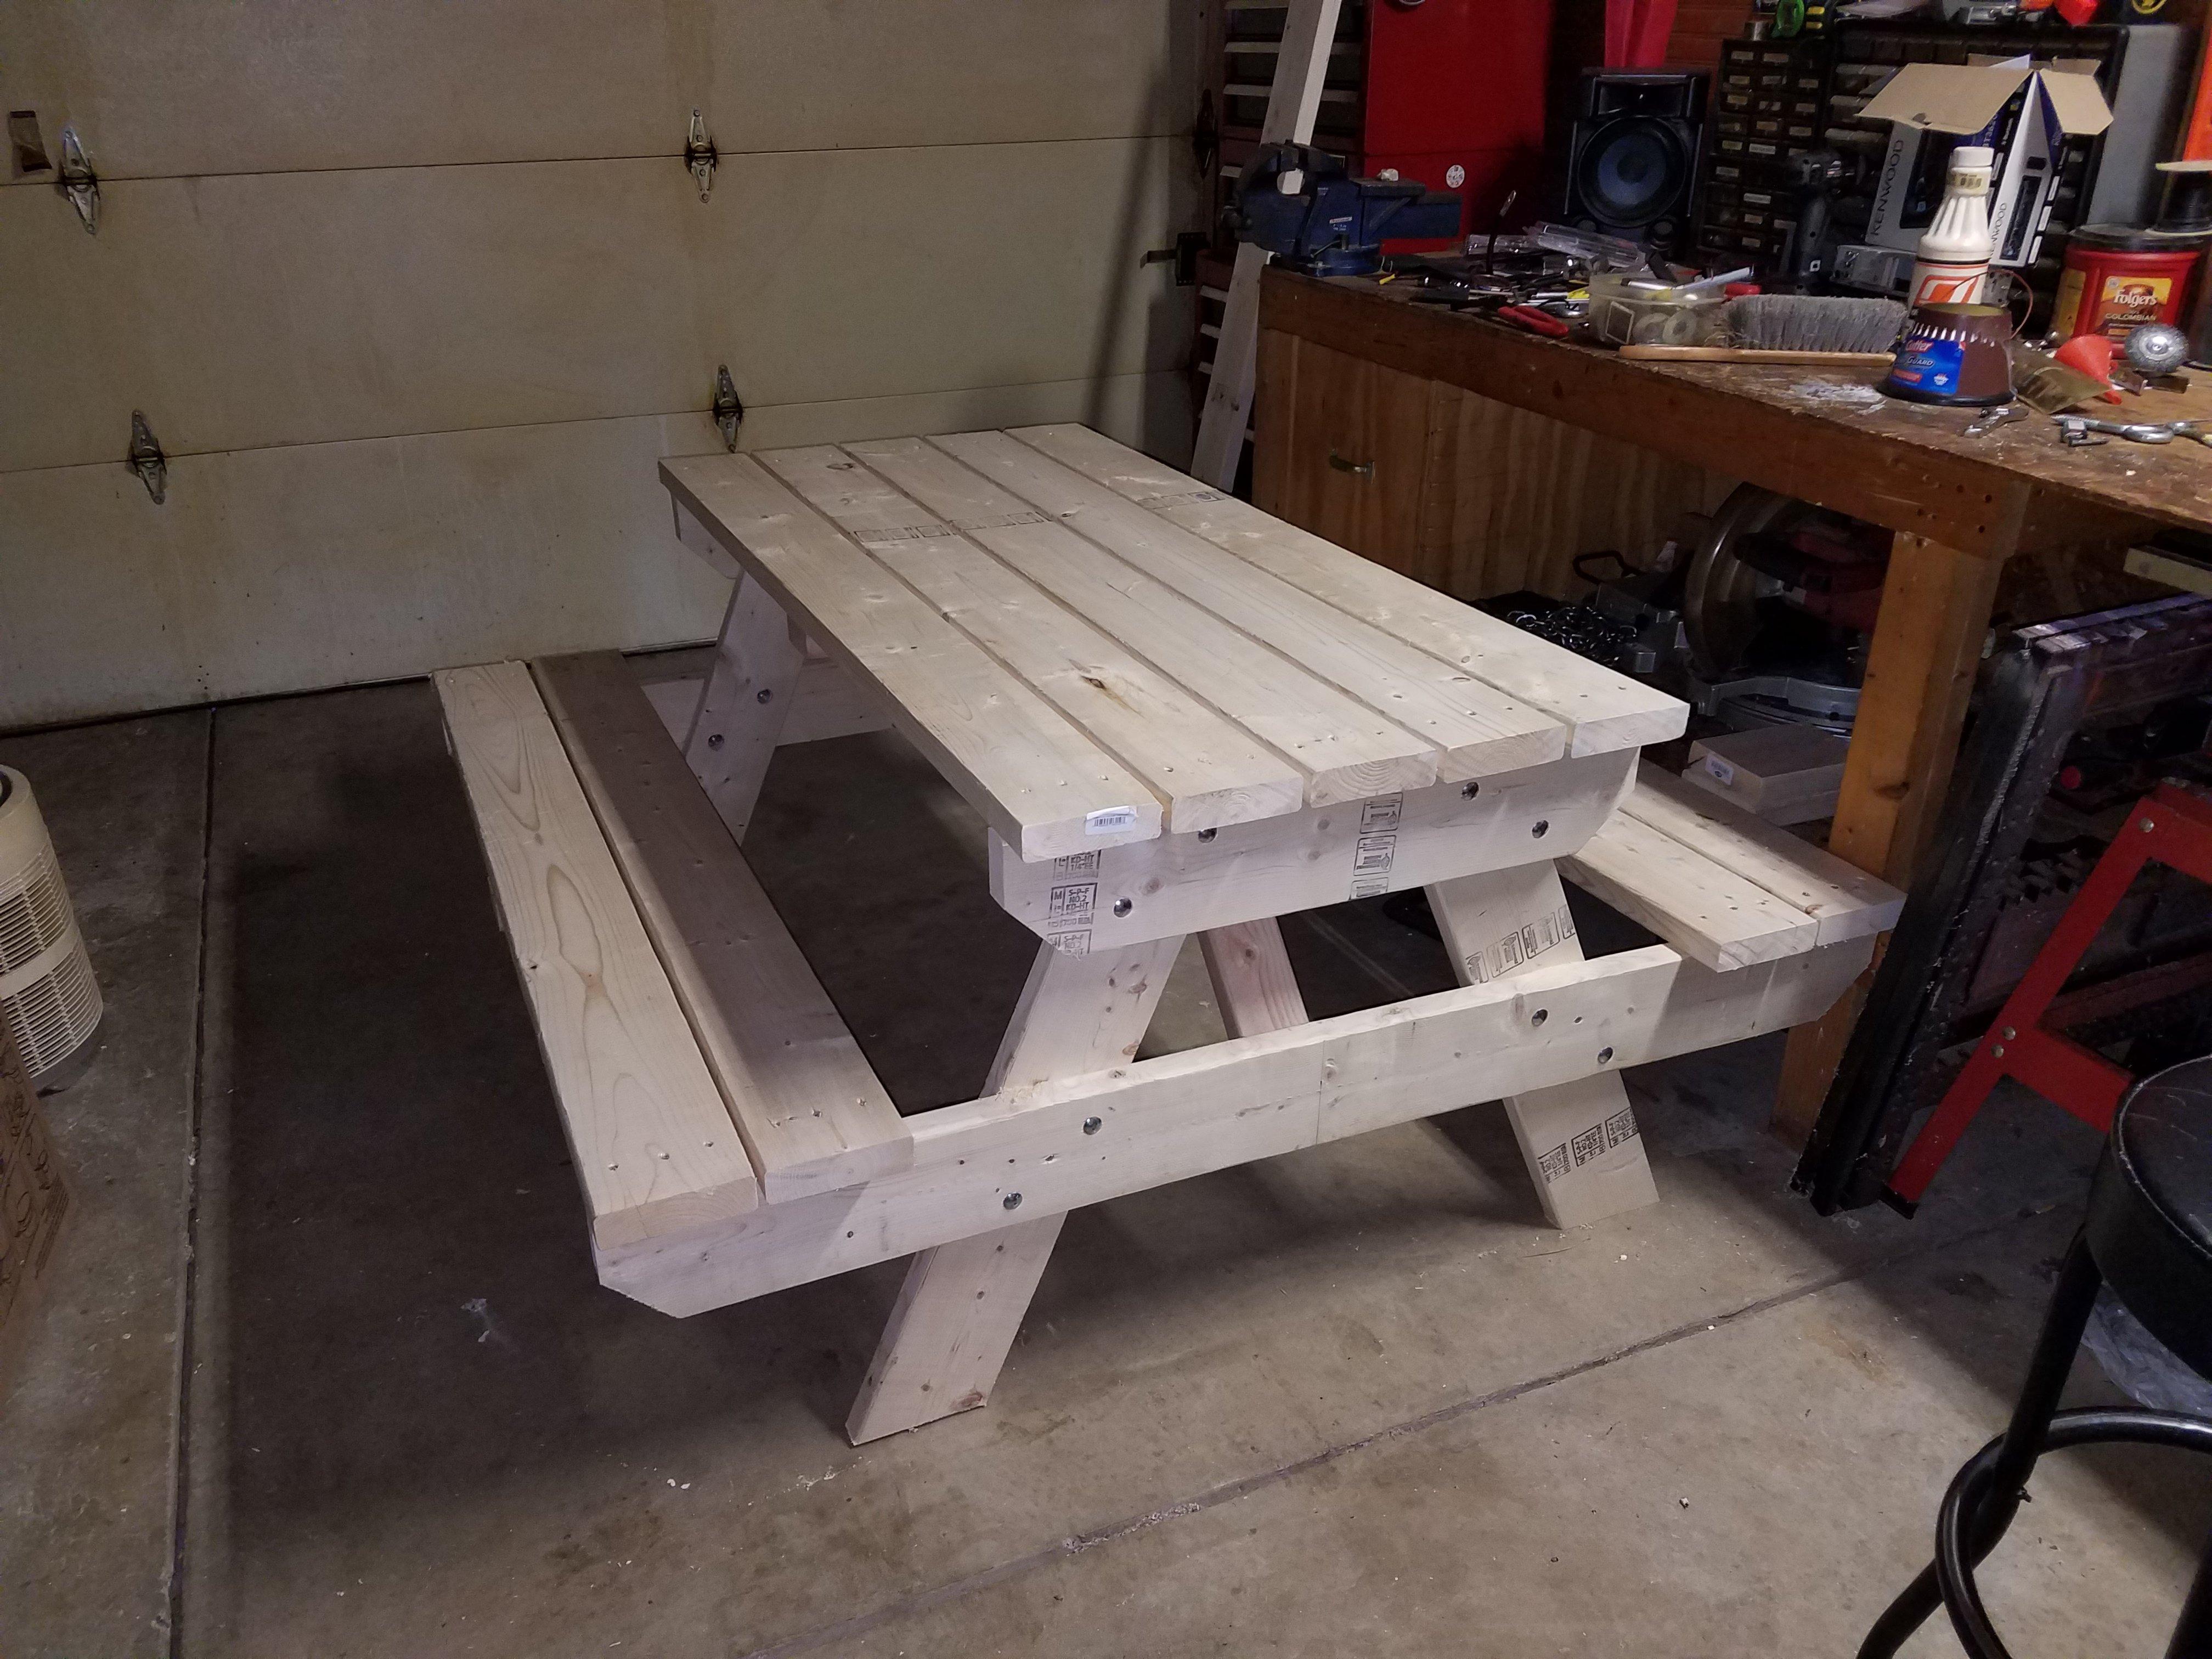 Traditional Picnic Table Plans Construct - Popular mechanics picnic table